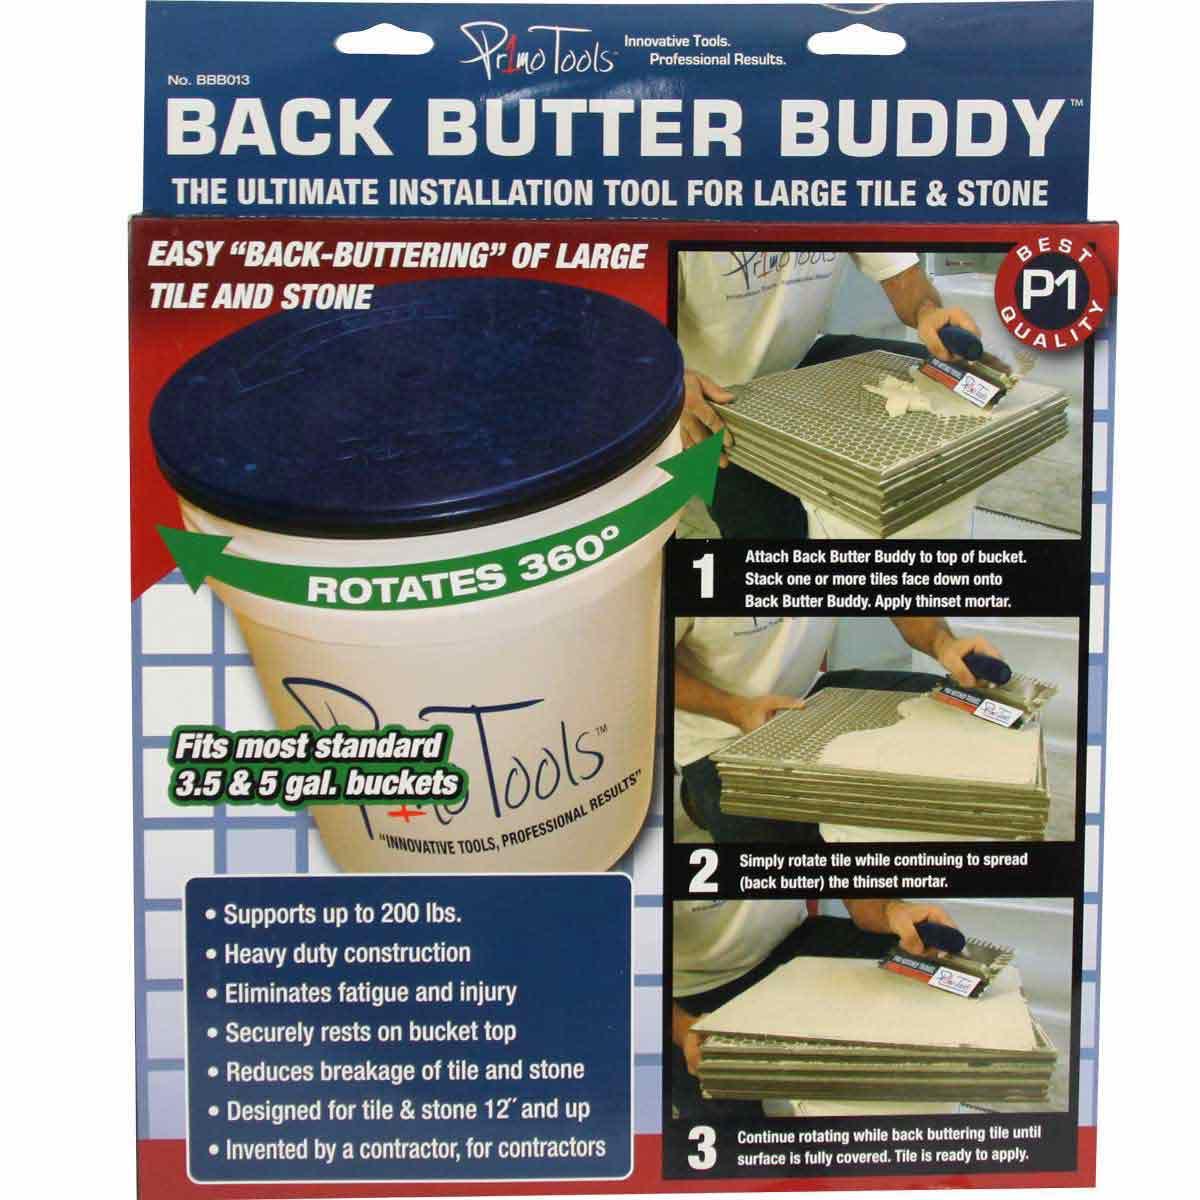 Back Butter Buddy instructions